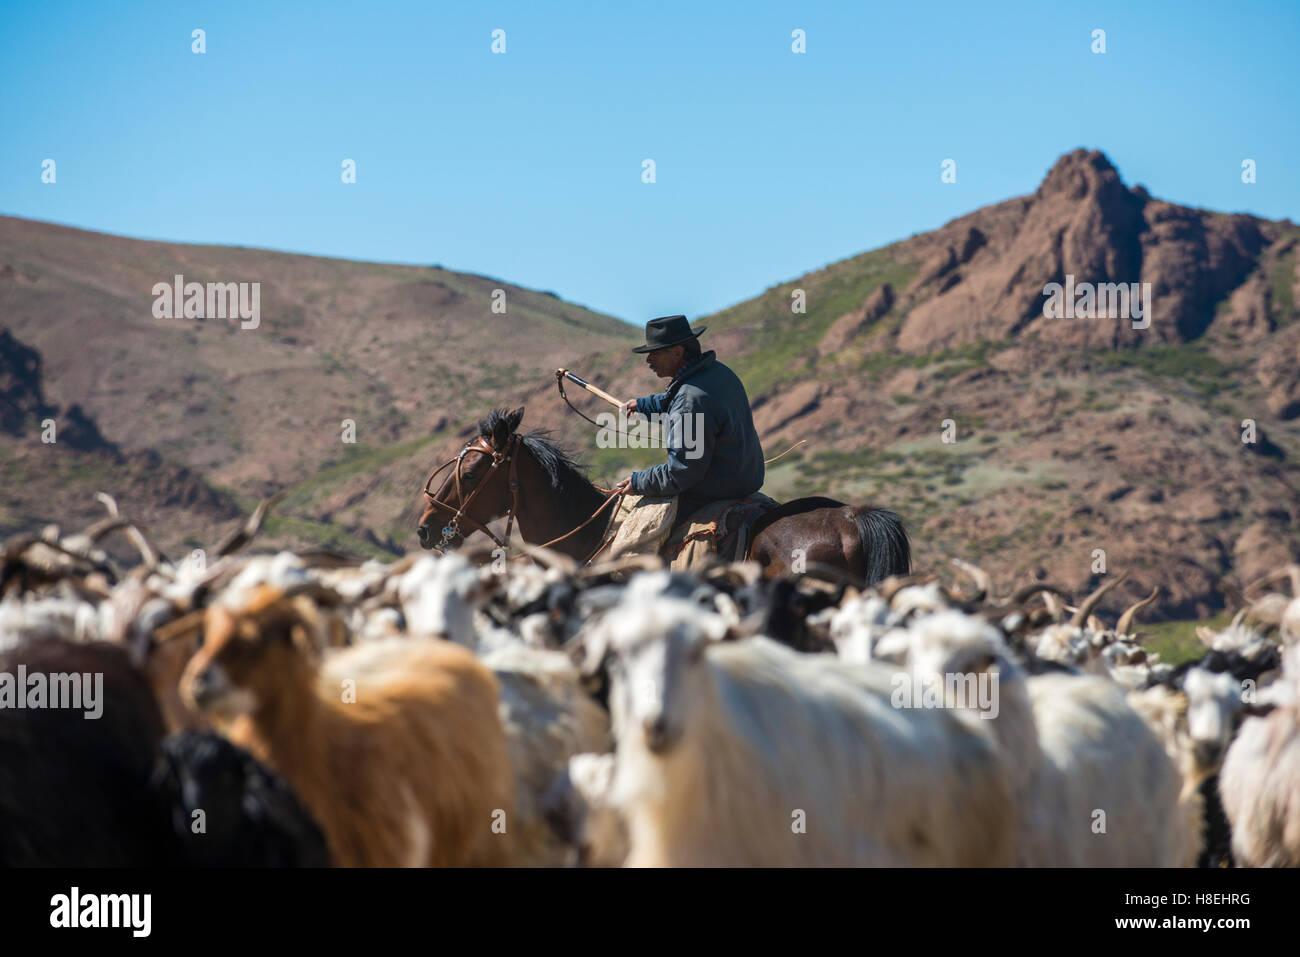 Gaucho on horseback herding goats along Route 40, Argentina, South America - Stock Image